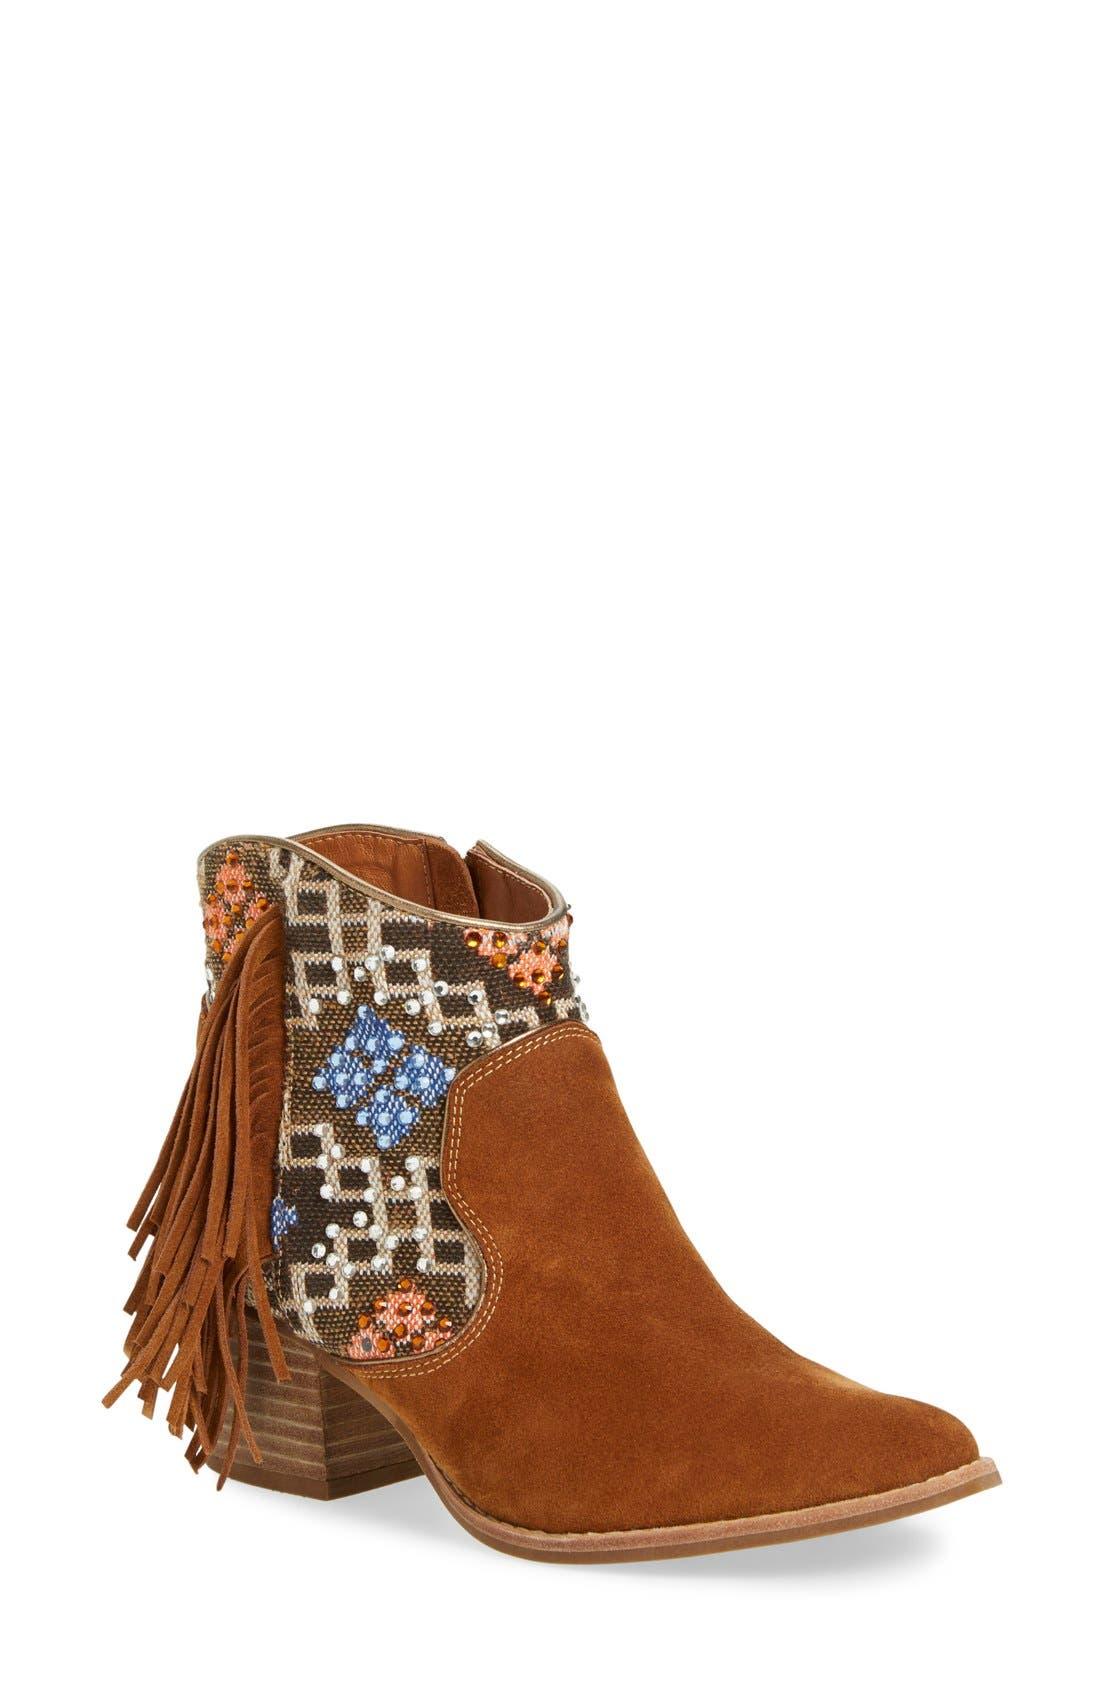 Main Image - ZiGi girl 'Odel' Embellished Fringe Bootie (Women)